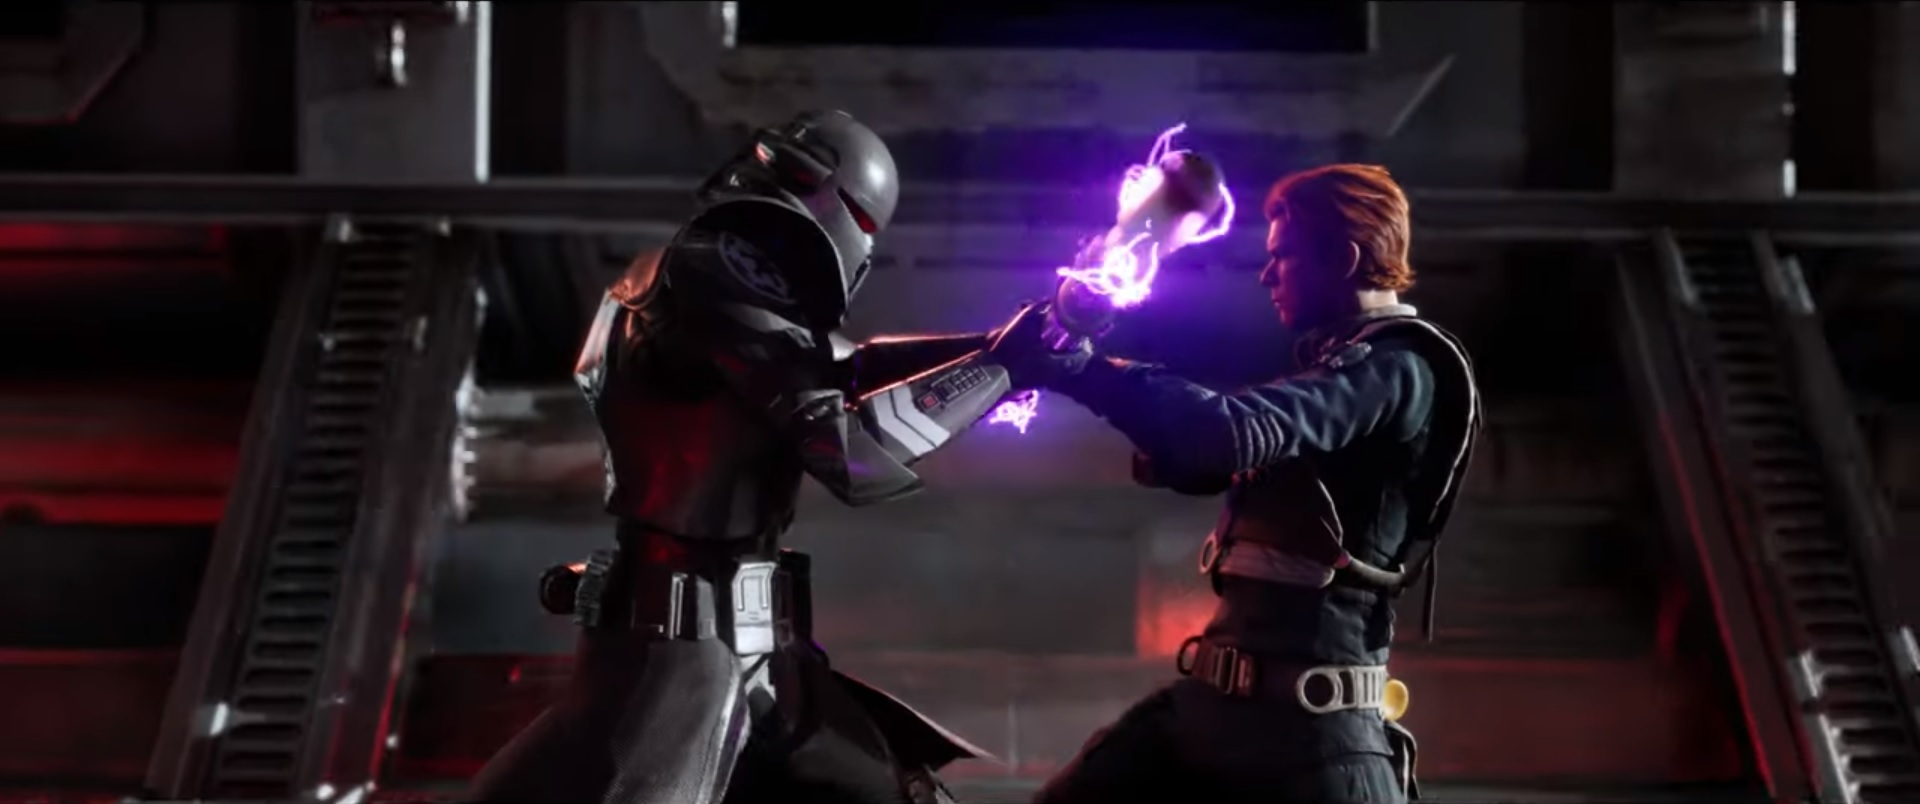 star wars jedi fallen order purge trooper